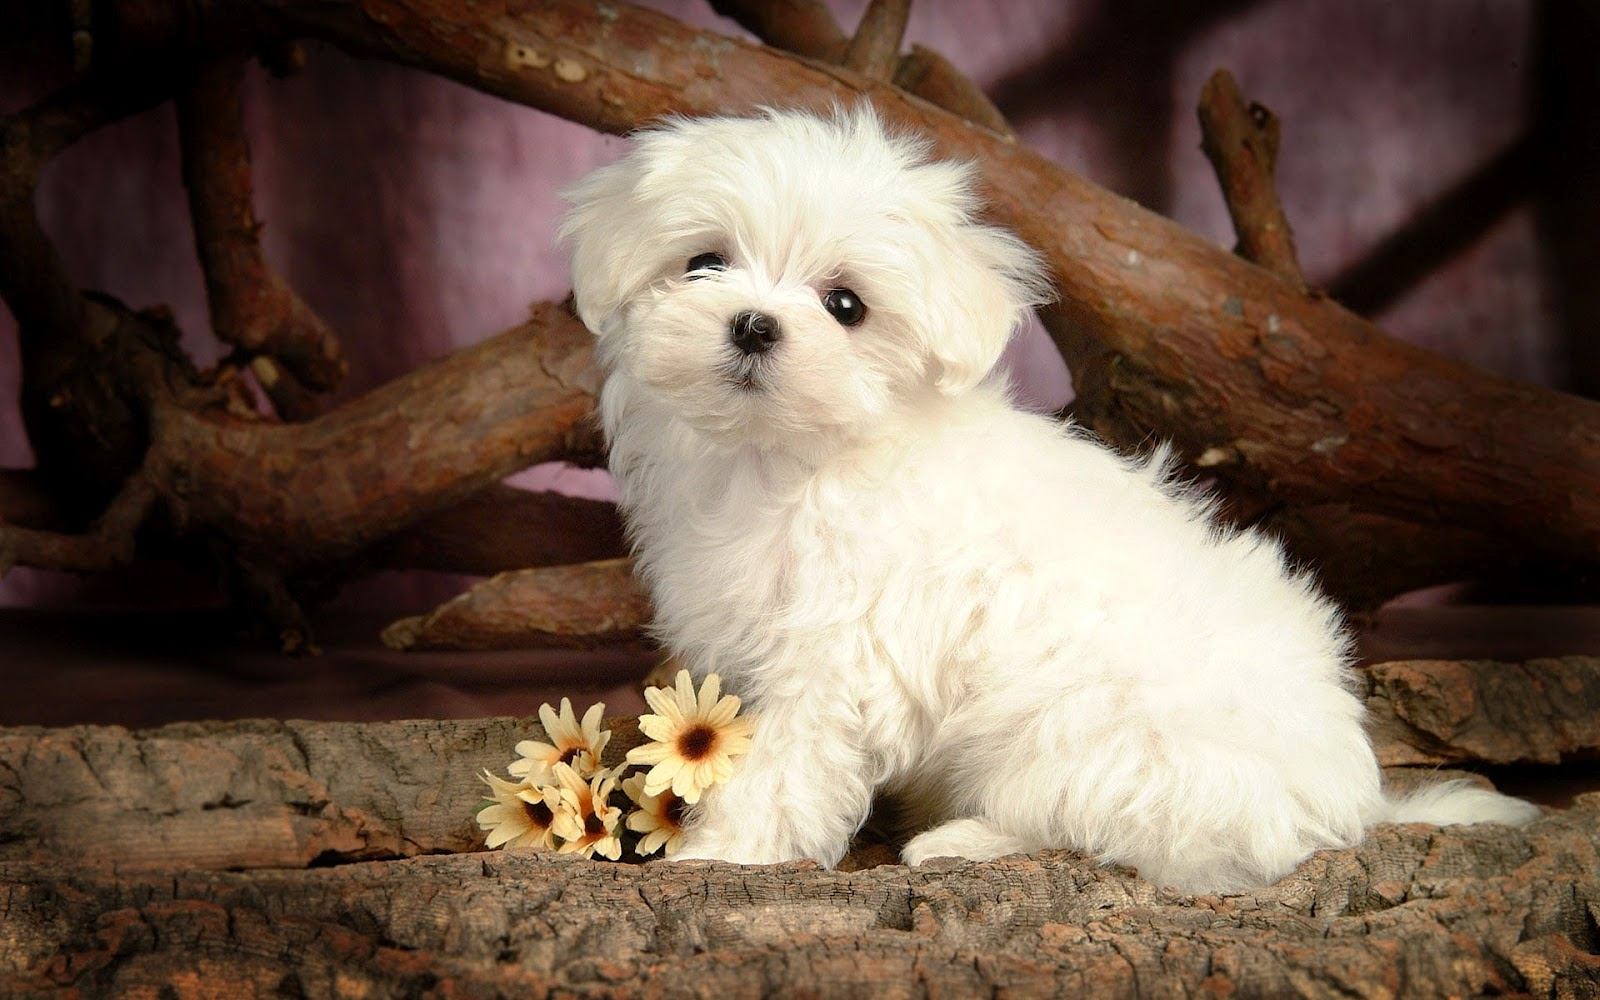 Cute little maltese dog wallpaper HD Animals Wallpapers 1600x1000